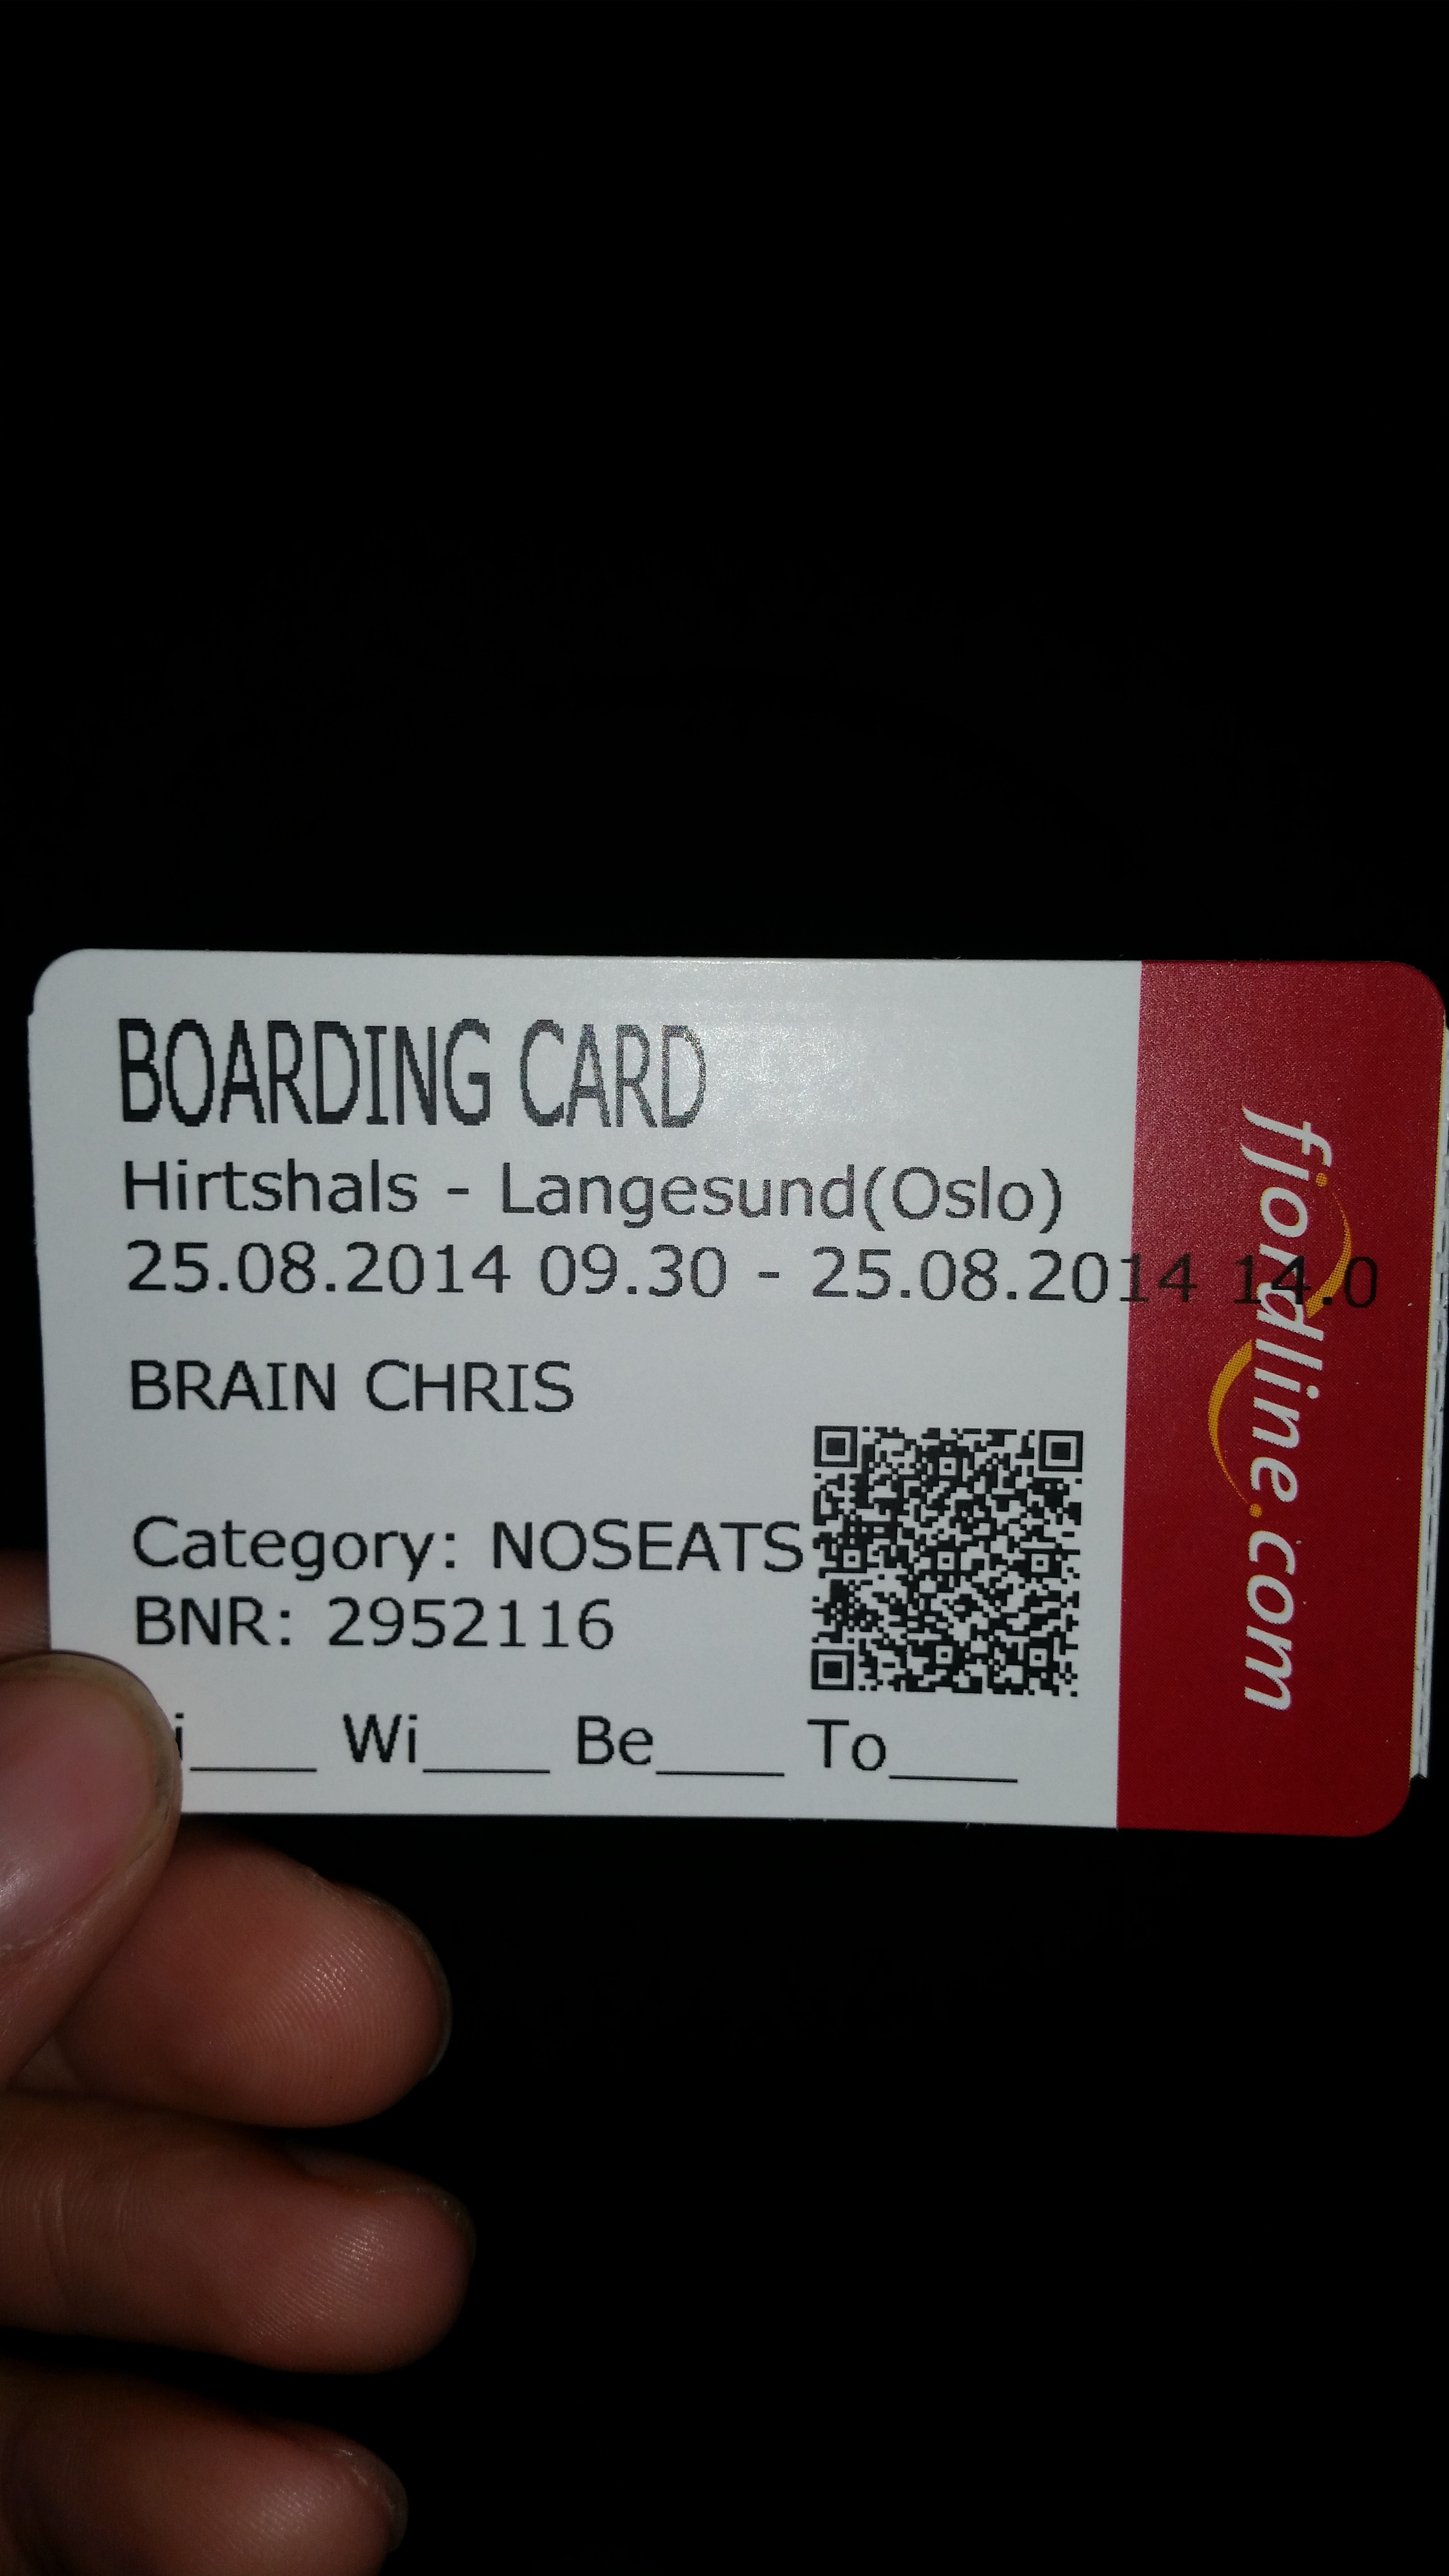 My boarding card!